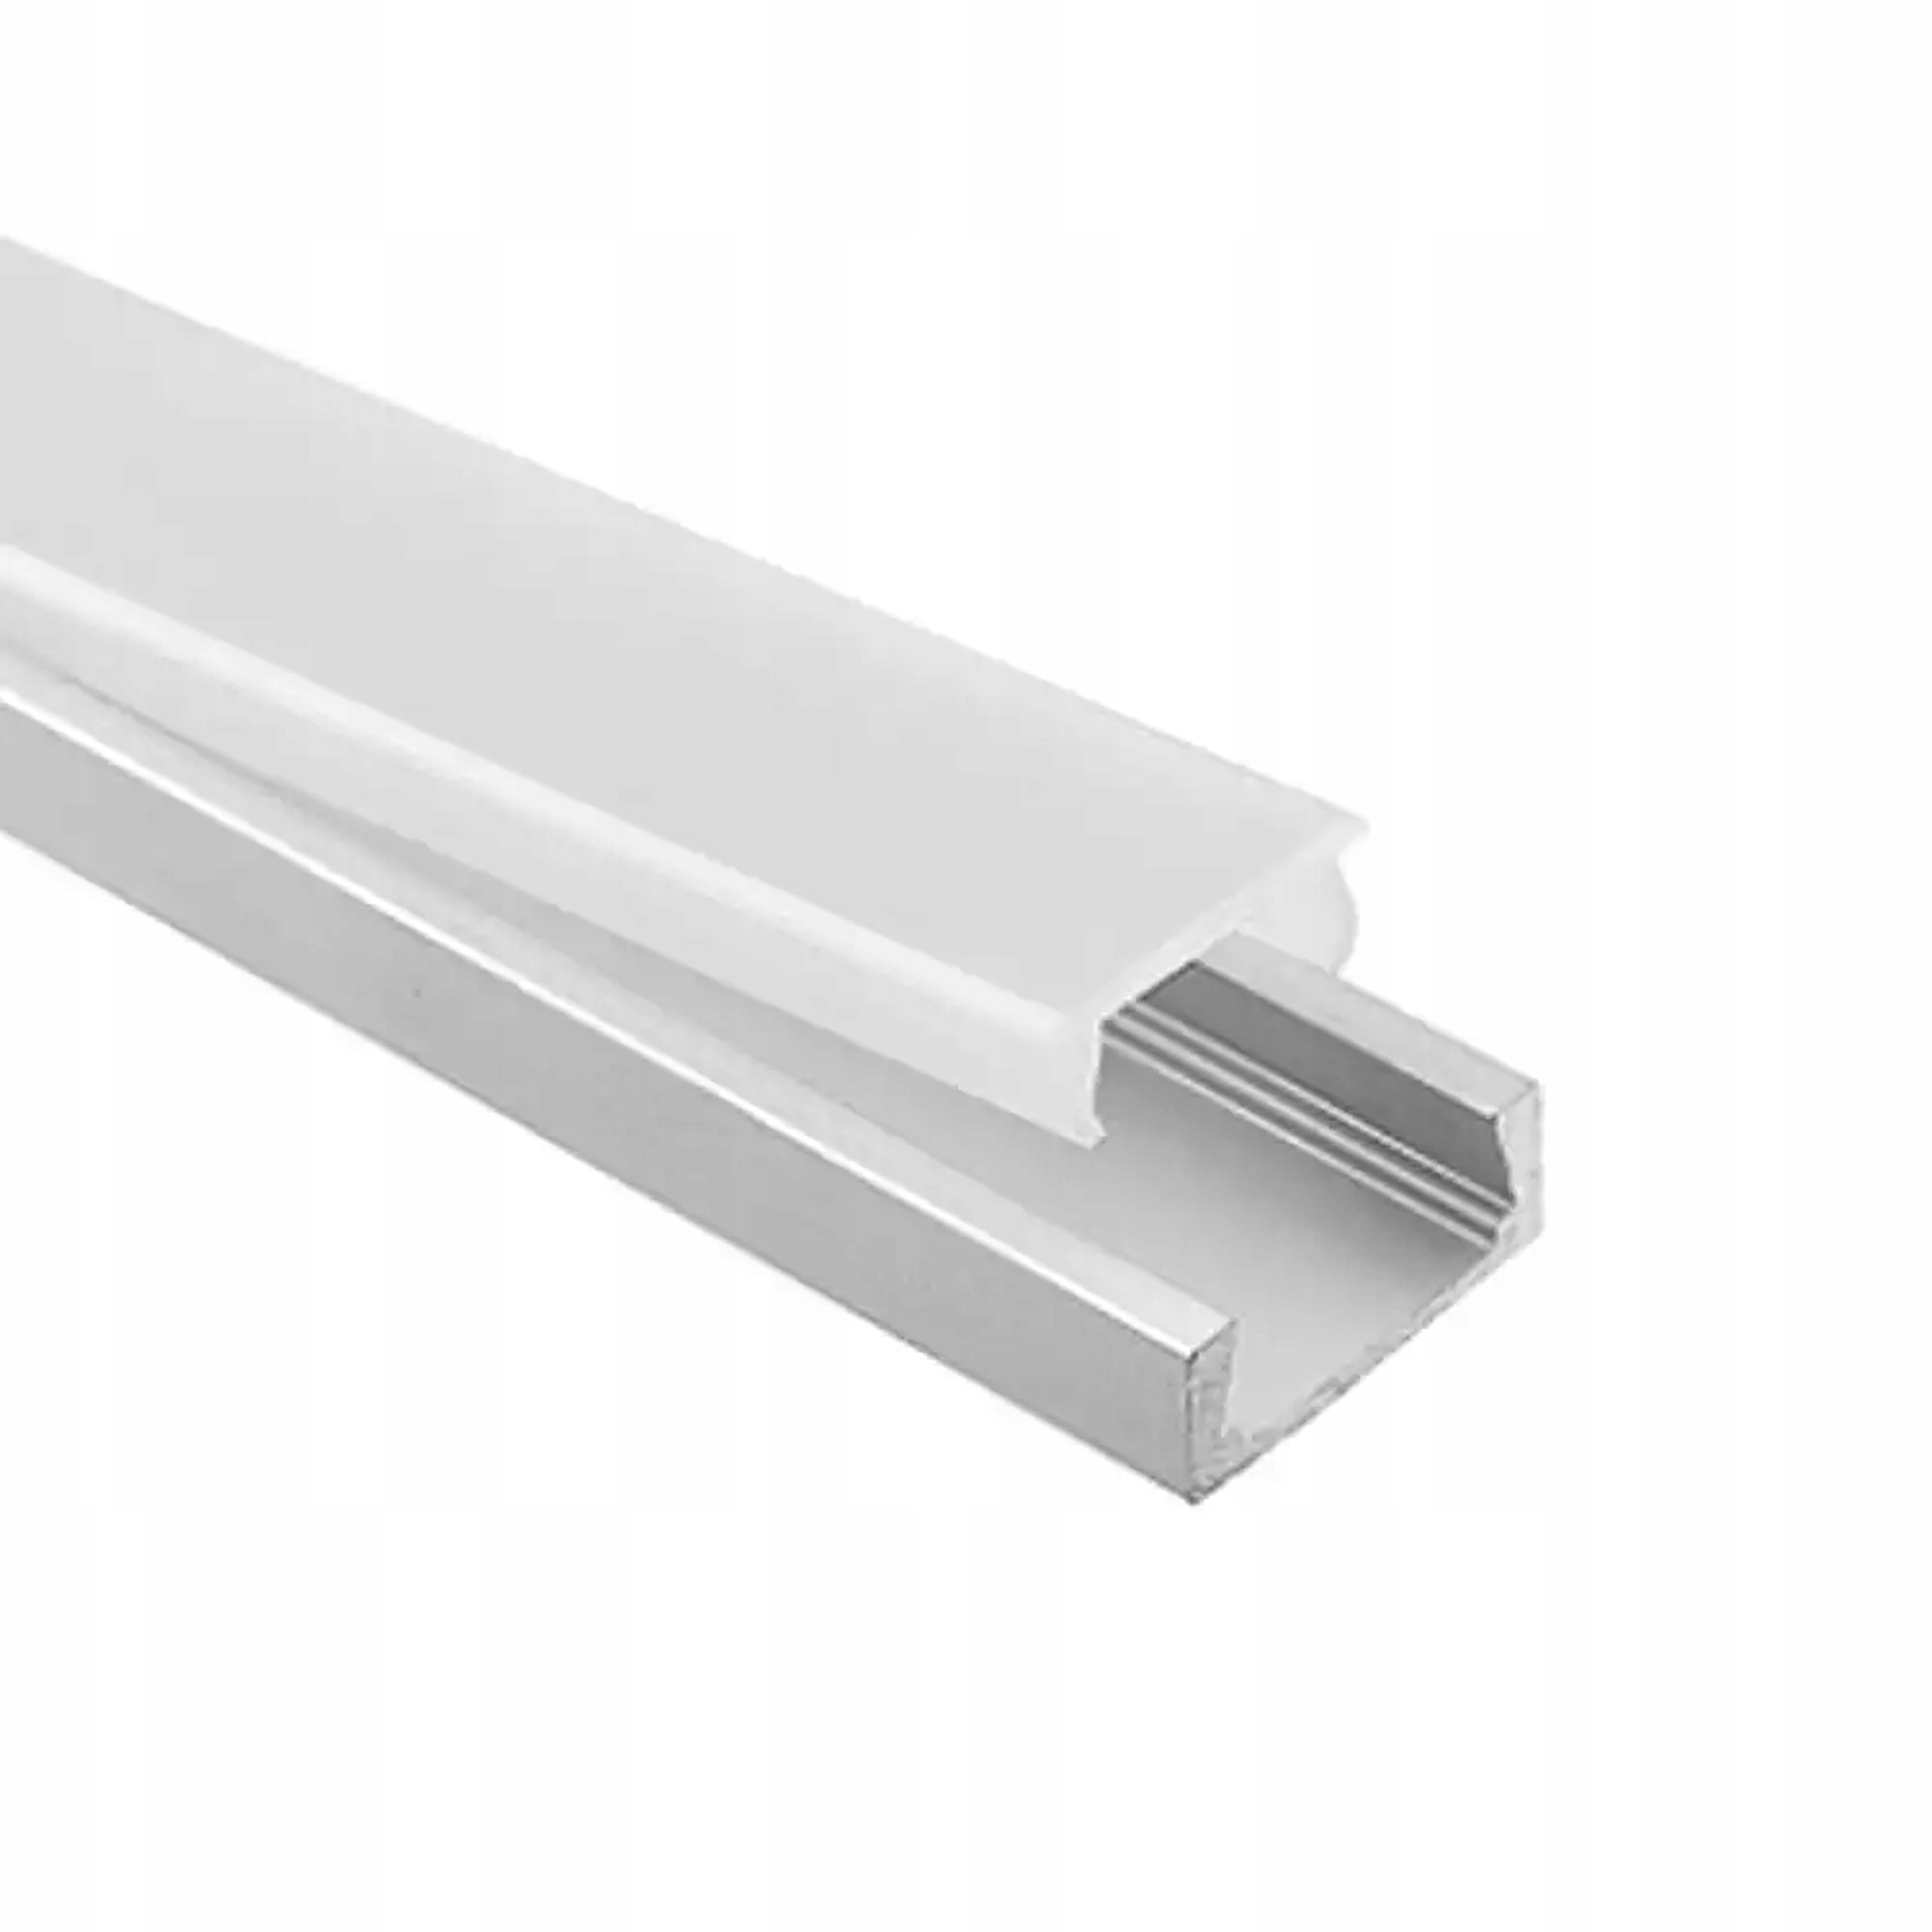 PROFIL - TAŚMA LED aluminiowy anod 2m + klosz klik